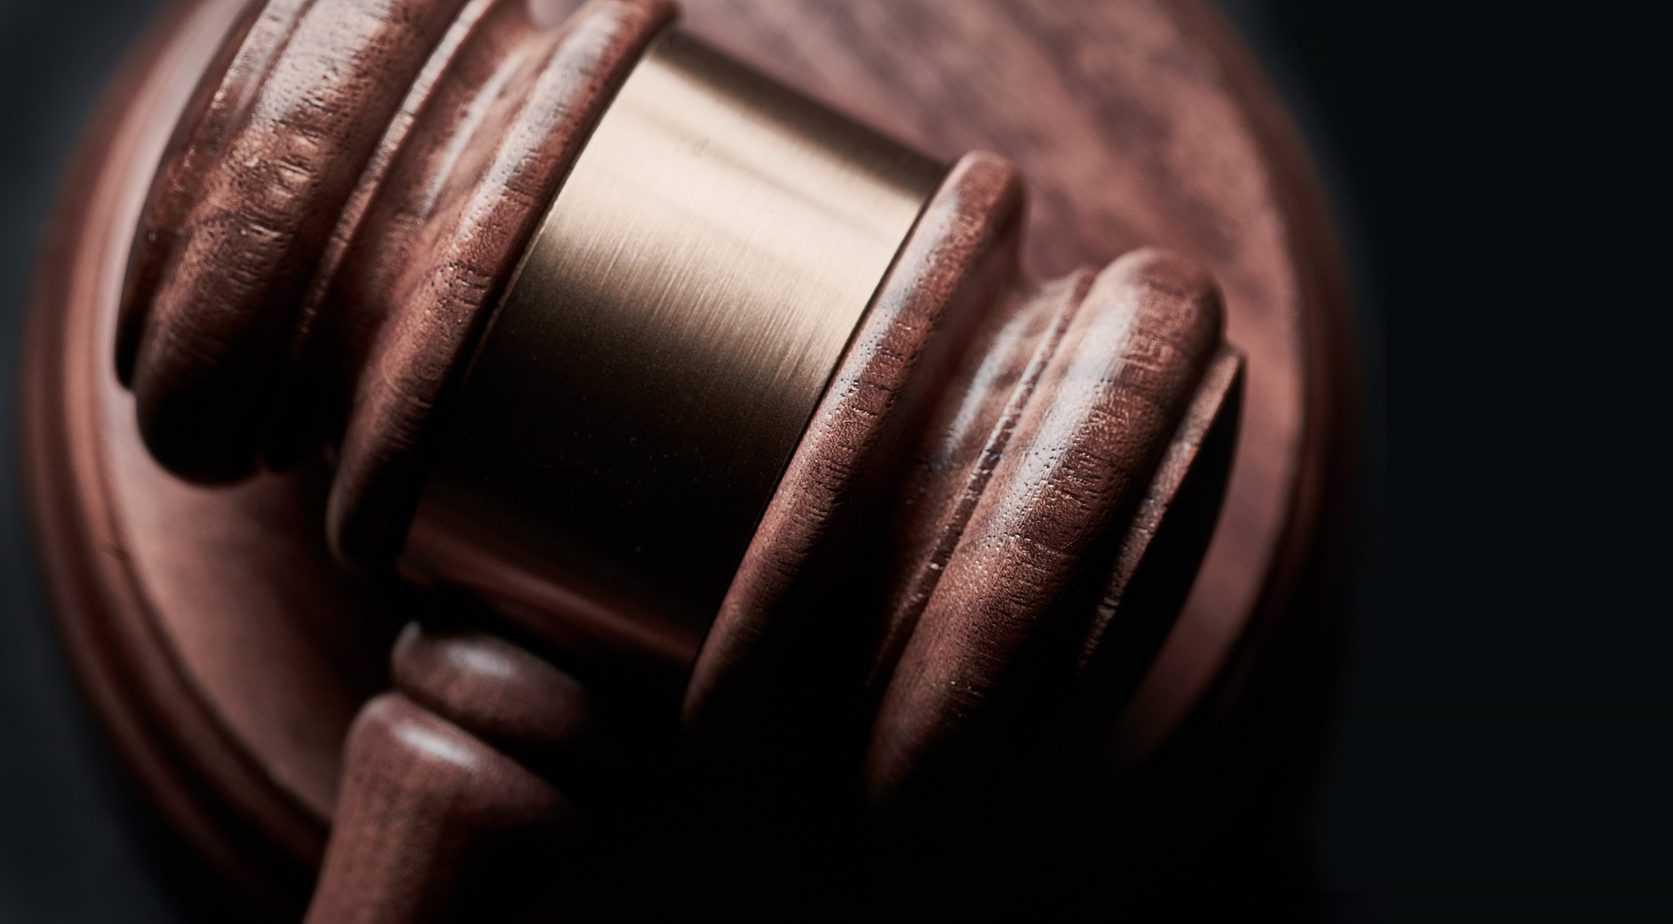 Ways to Afford Legal Help